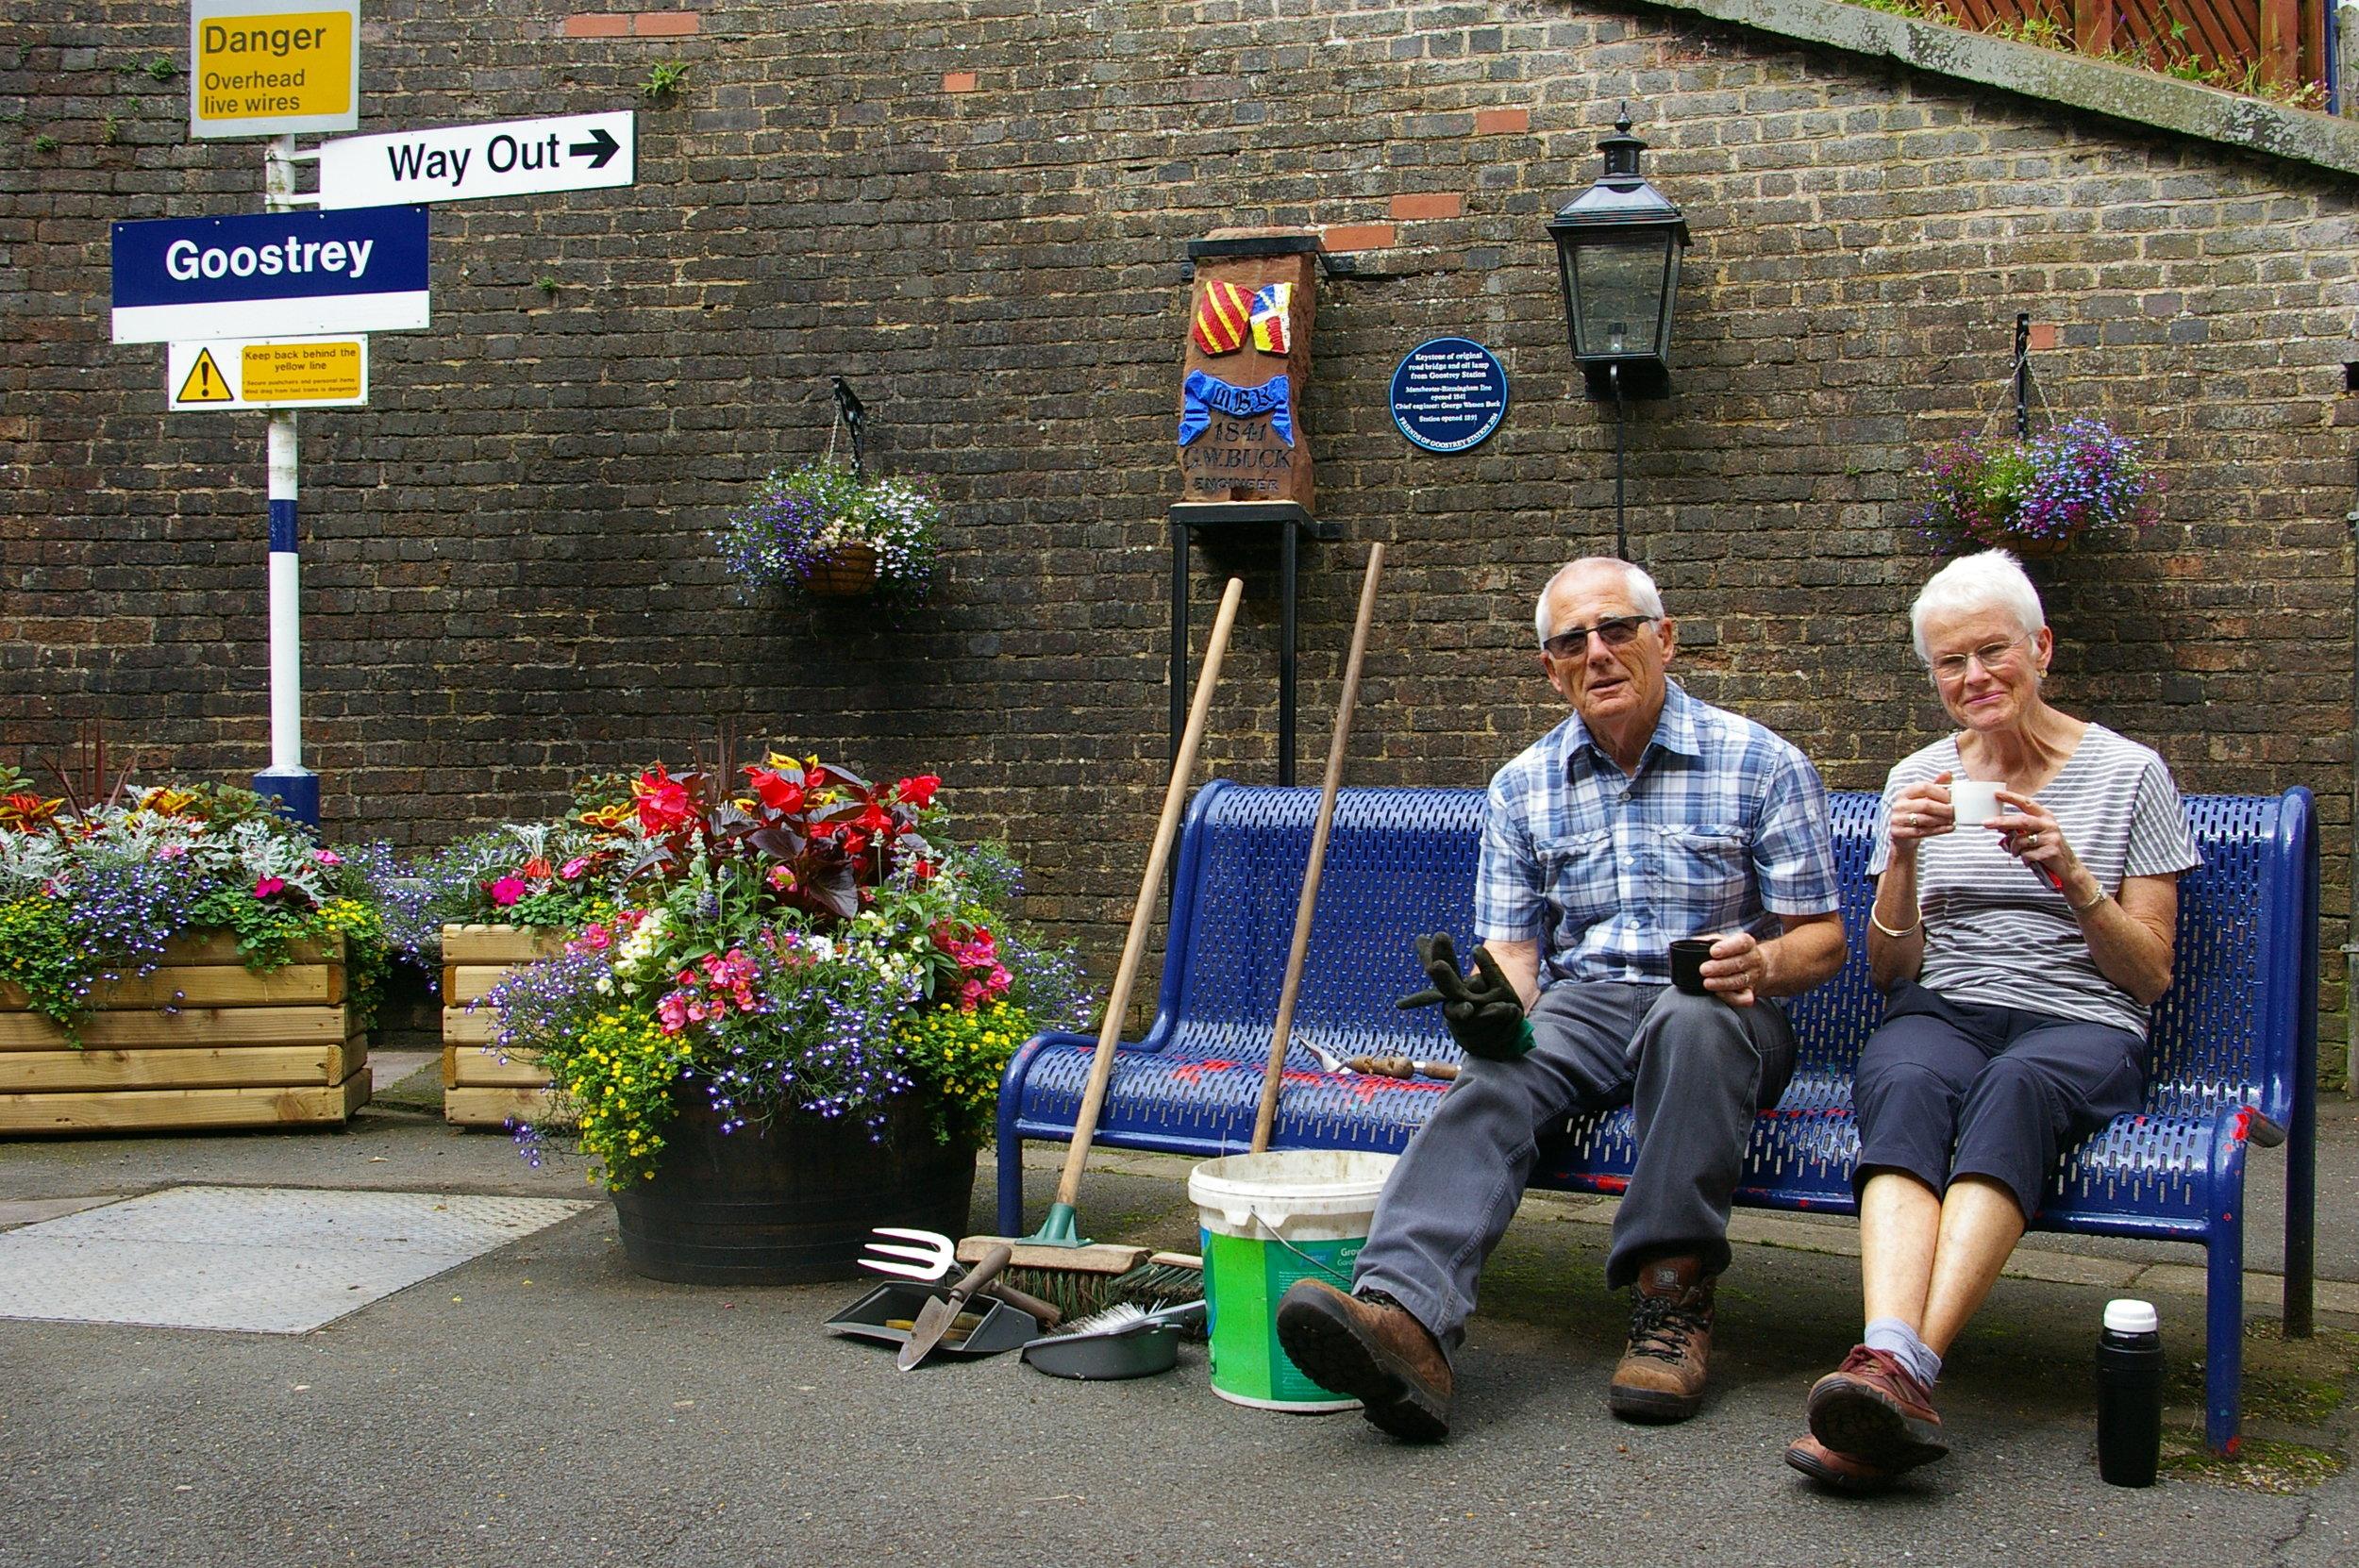 flowering plants and railway memorabilia create a pleasant seating area IMGP5275.jpg